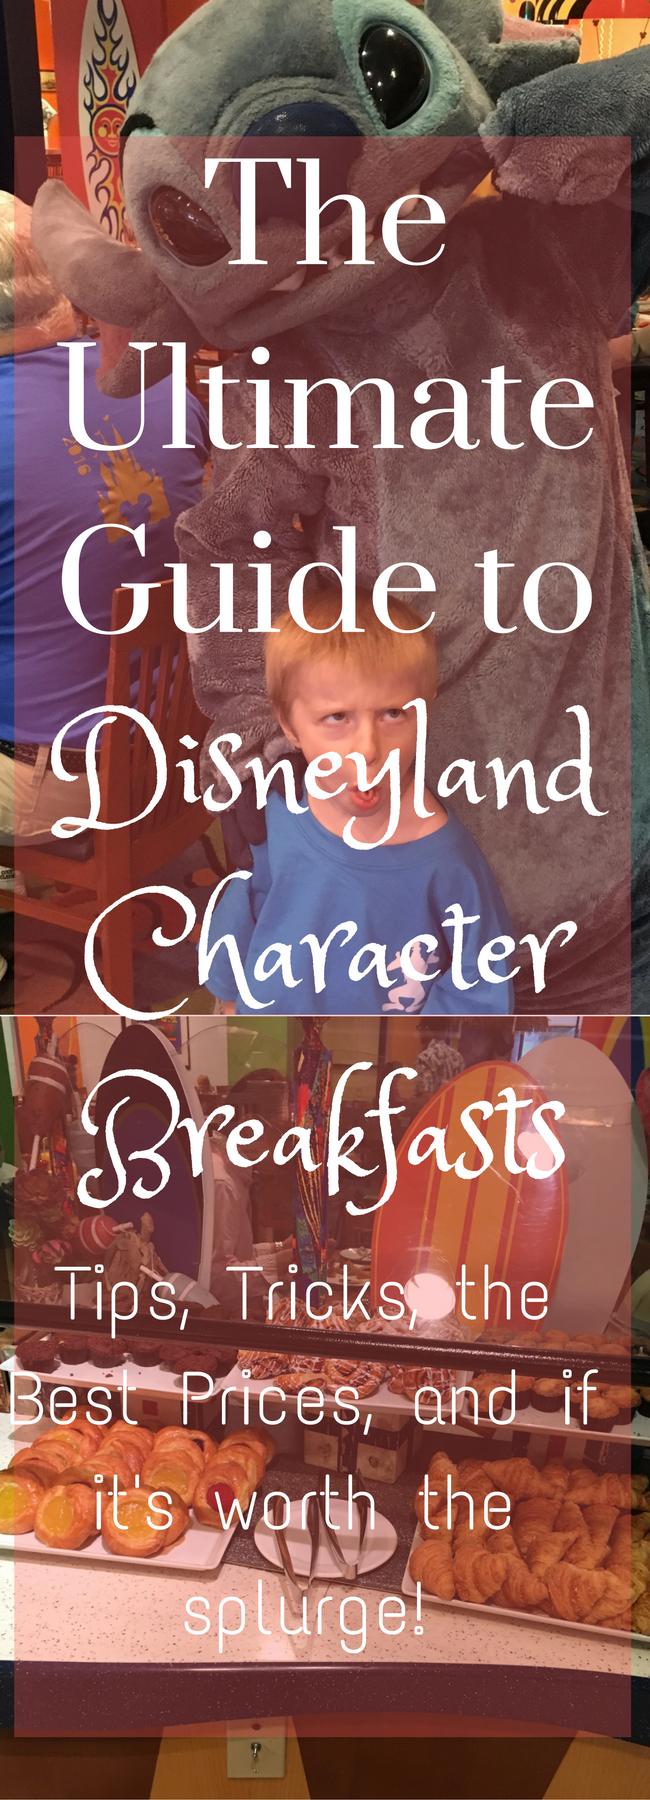 Disneyland / Disneyland Secrets / Disneyland Character Dining / Disneyland Tips / disneyland!! / disneyland planning / Disneyland Food / Disneyland Characters